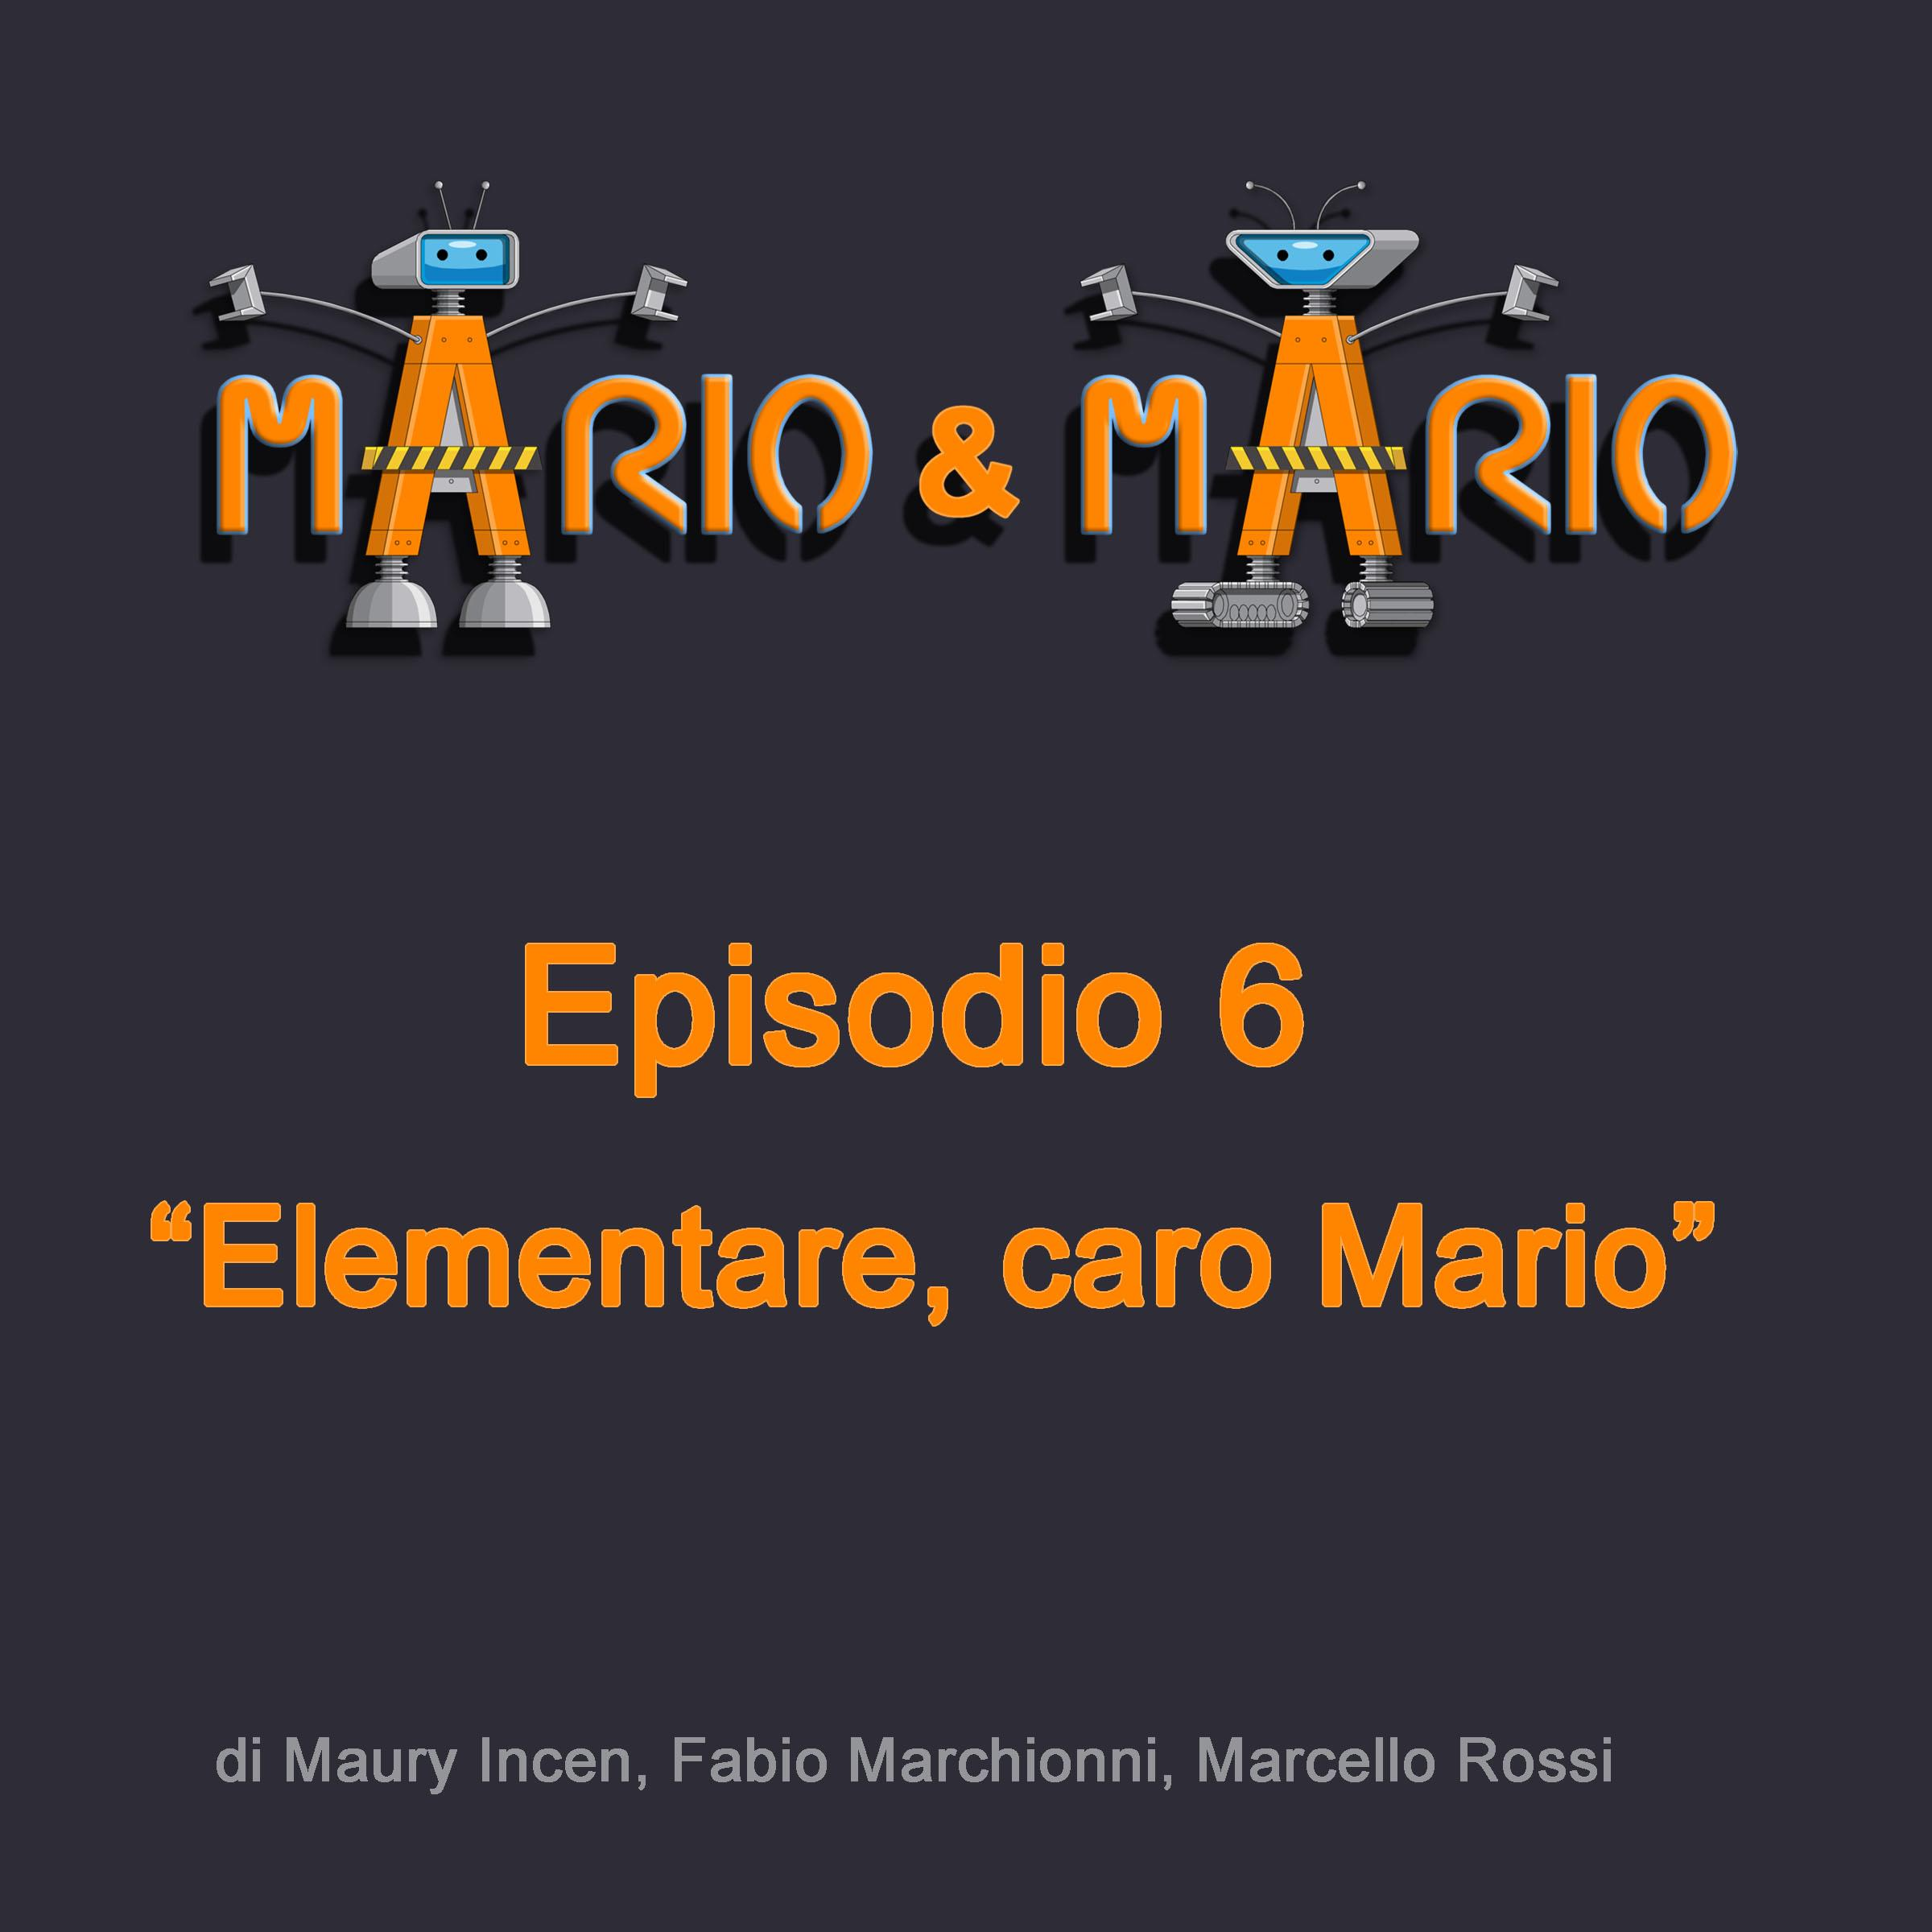 Elementare, caro Mario